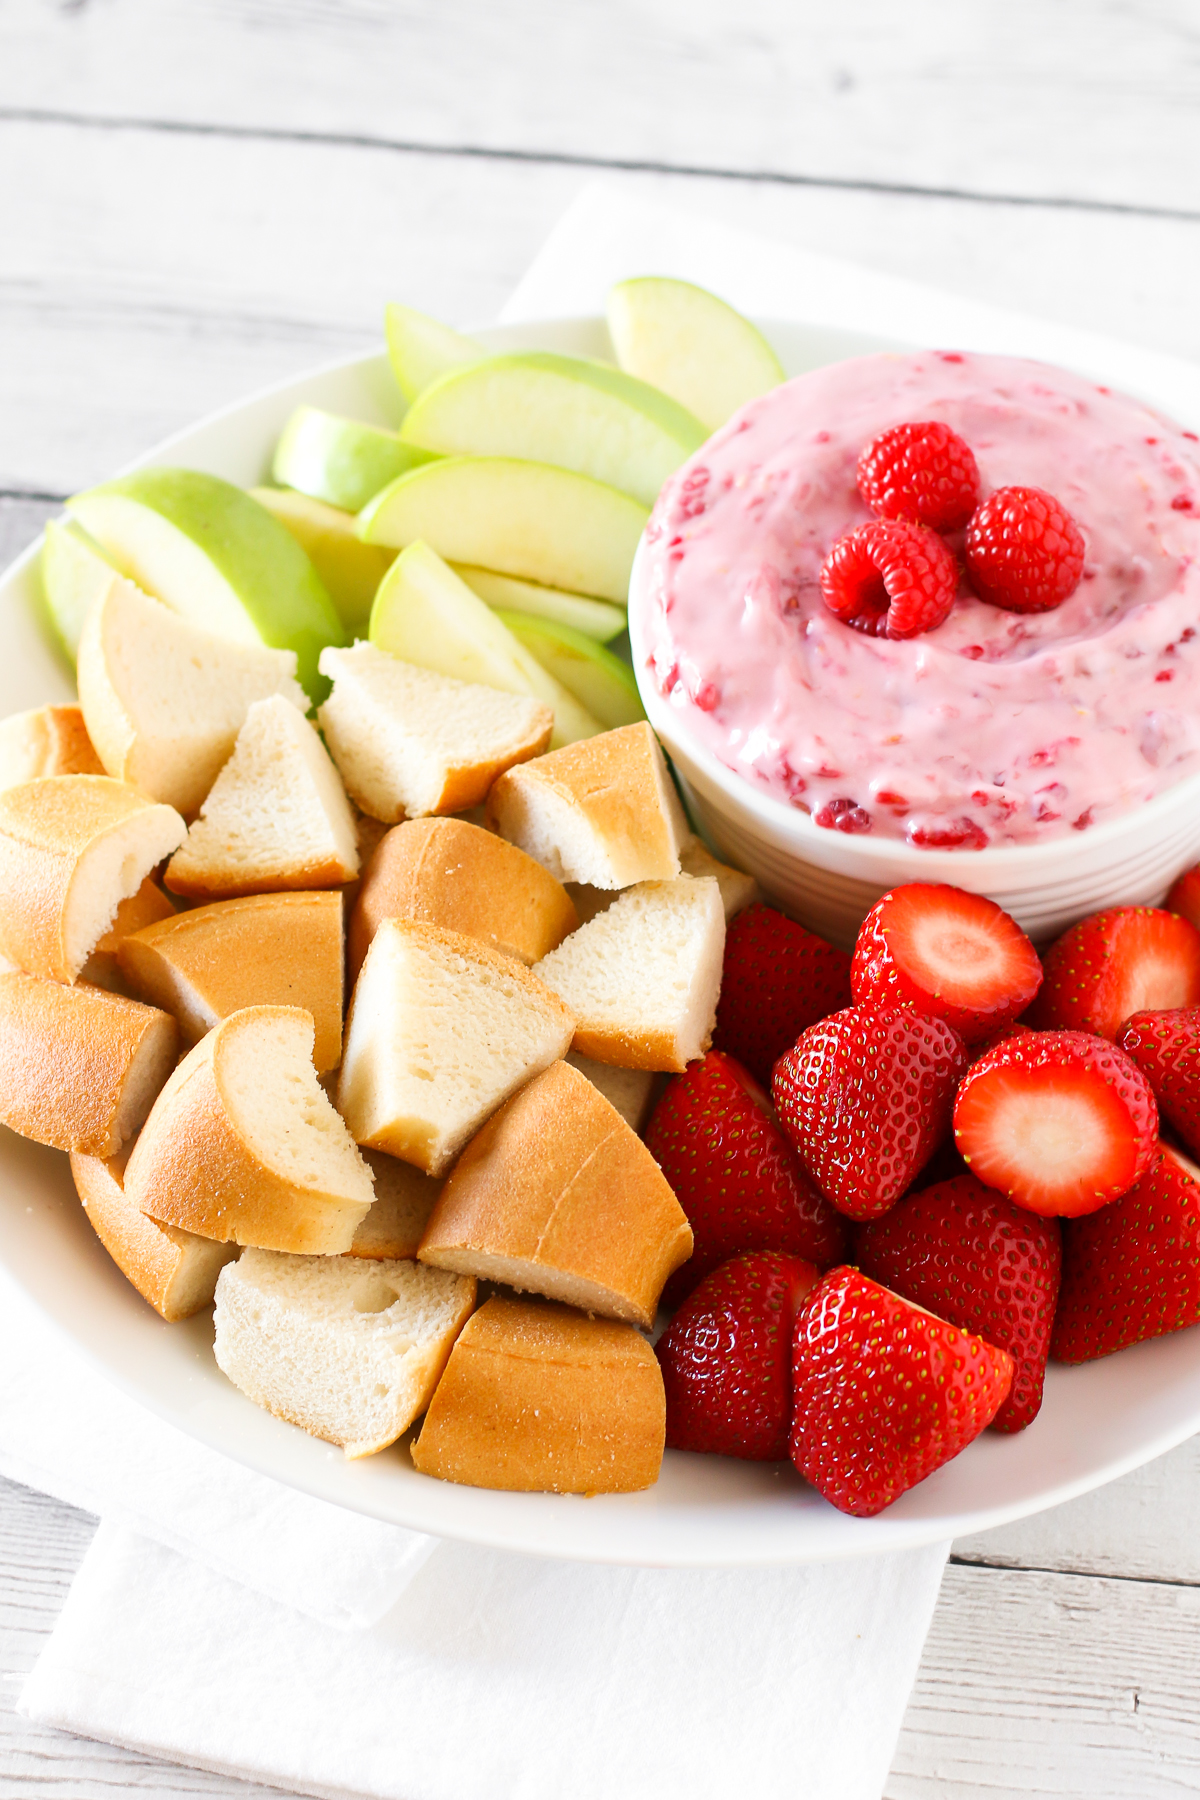 Dairy Free Raspberry Cheesecake Dip. Creamy cheesecake dip, with lemon and fresh raspberries. It's pinkalicious!